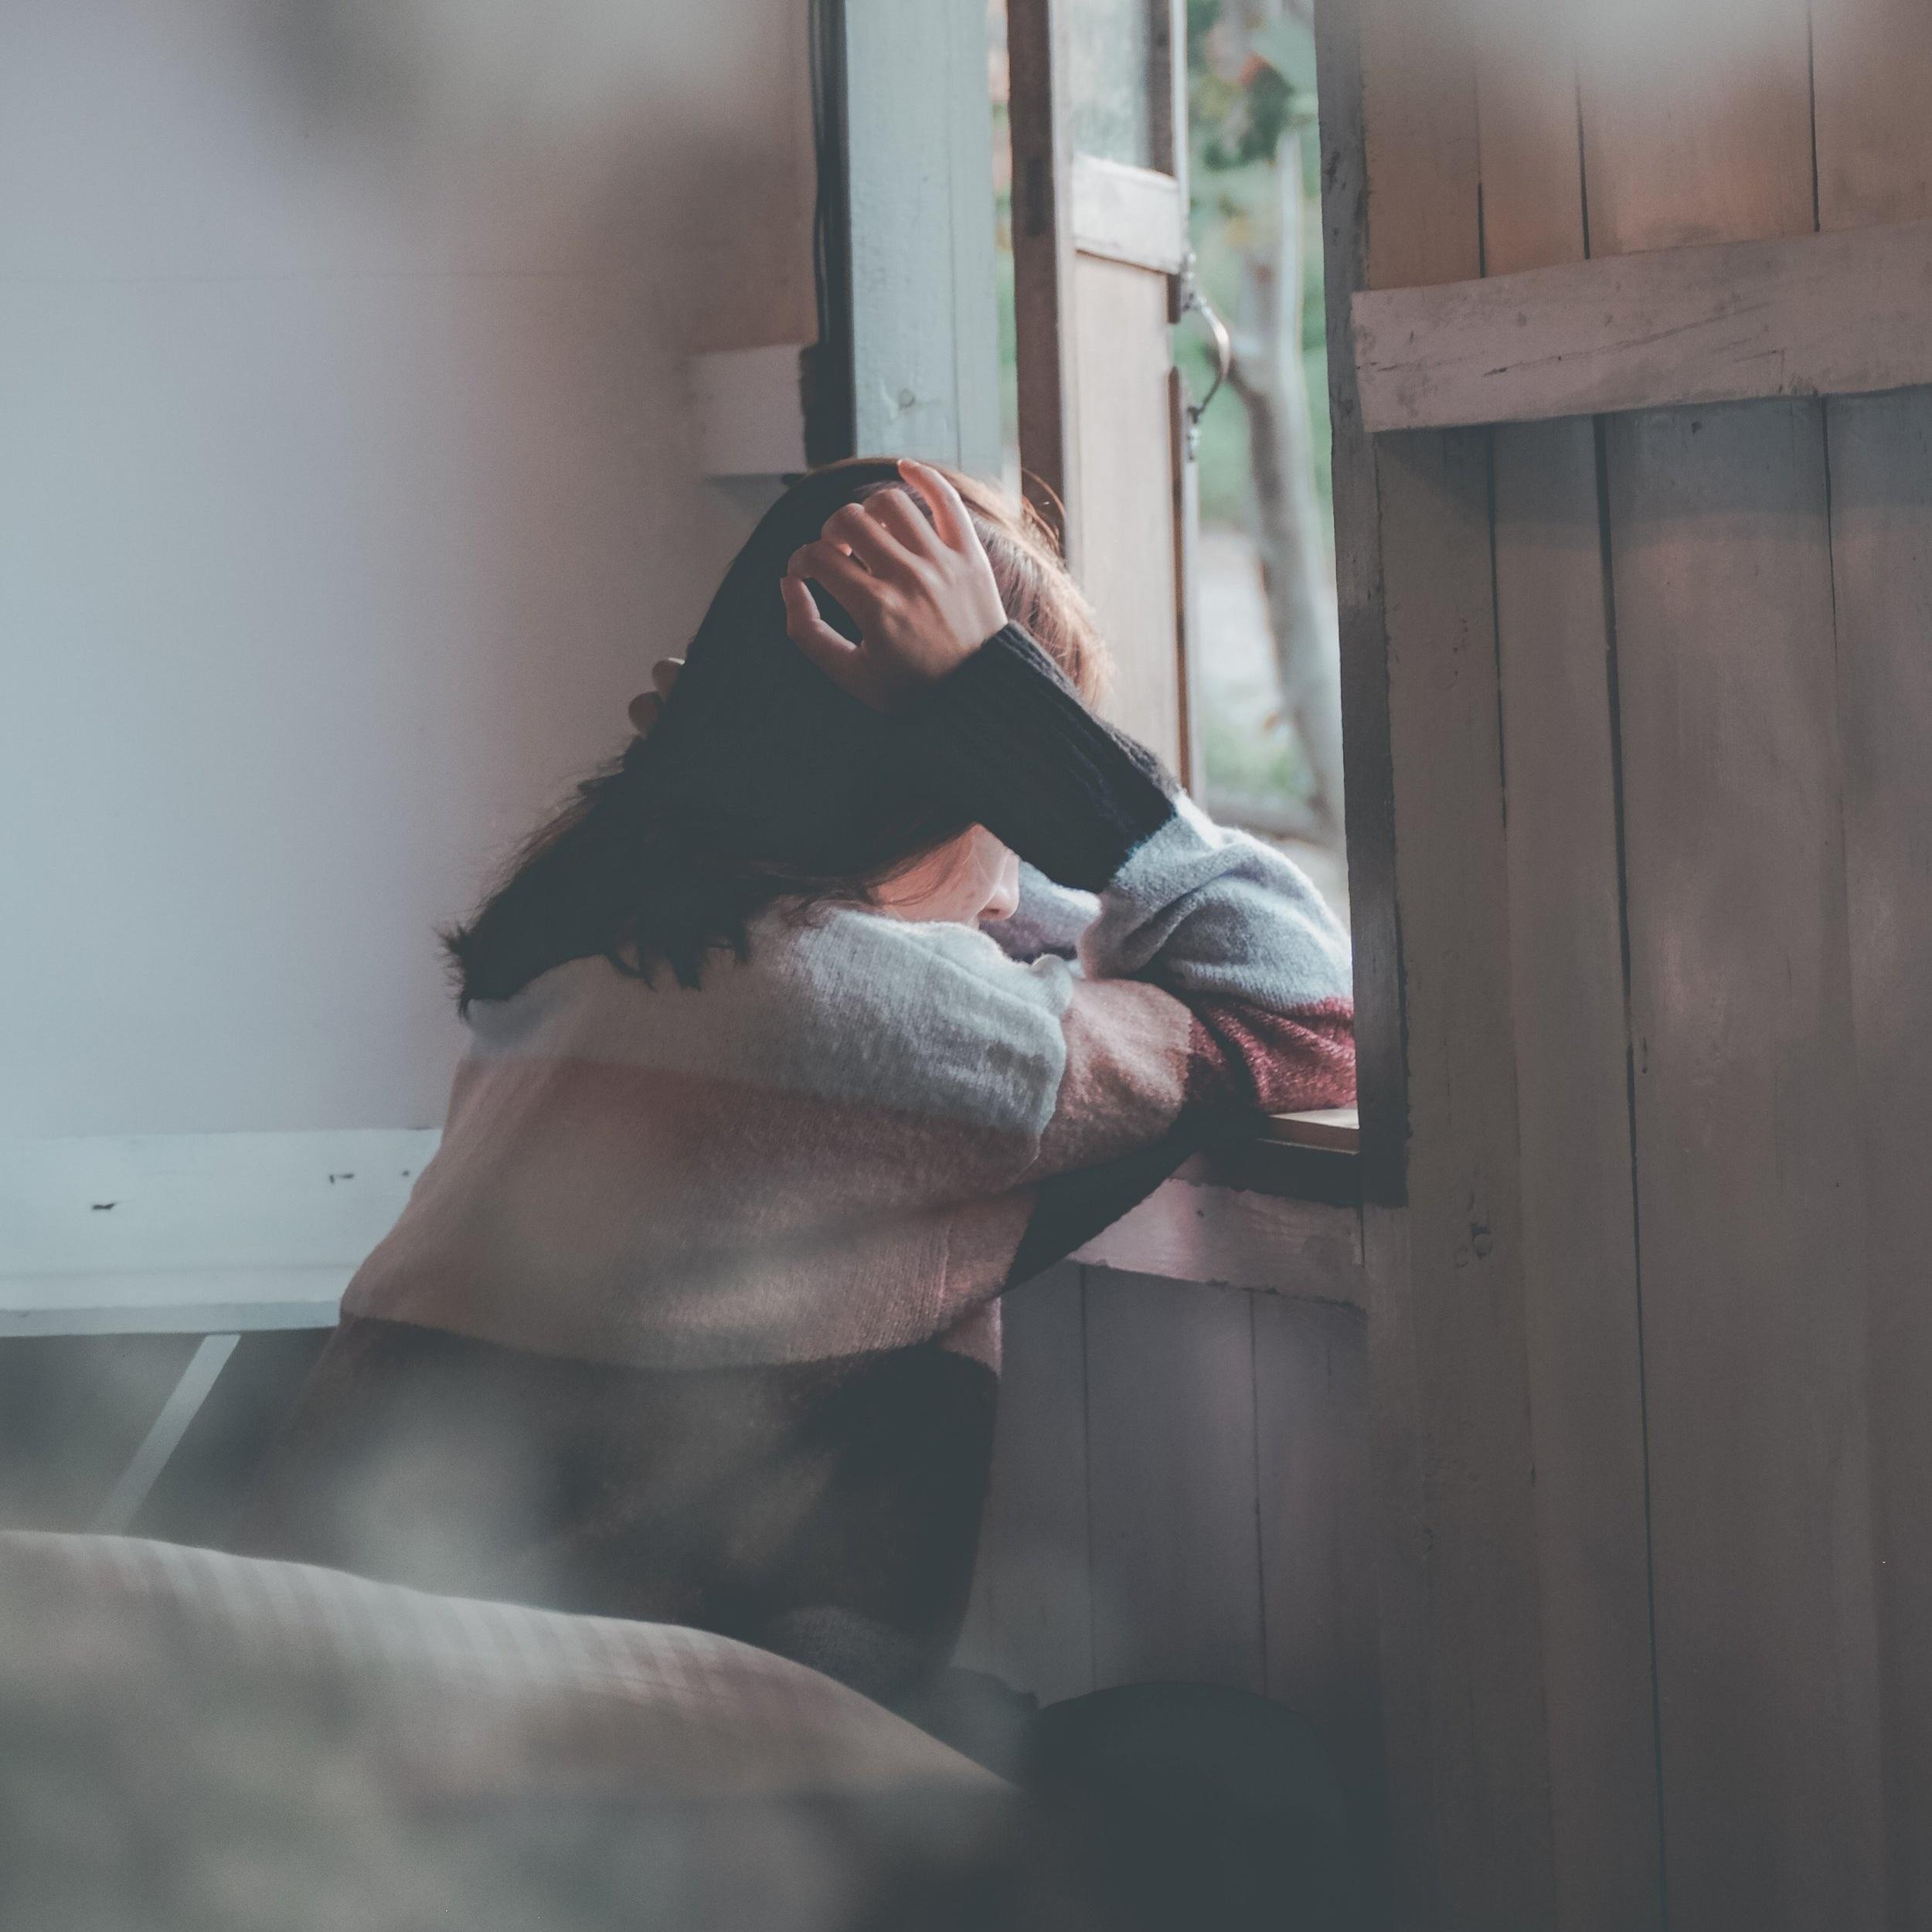 adult-alone-blur-1510149.jpg